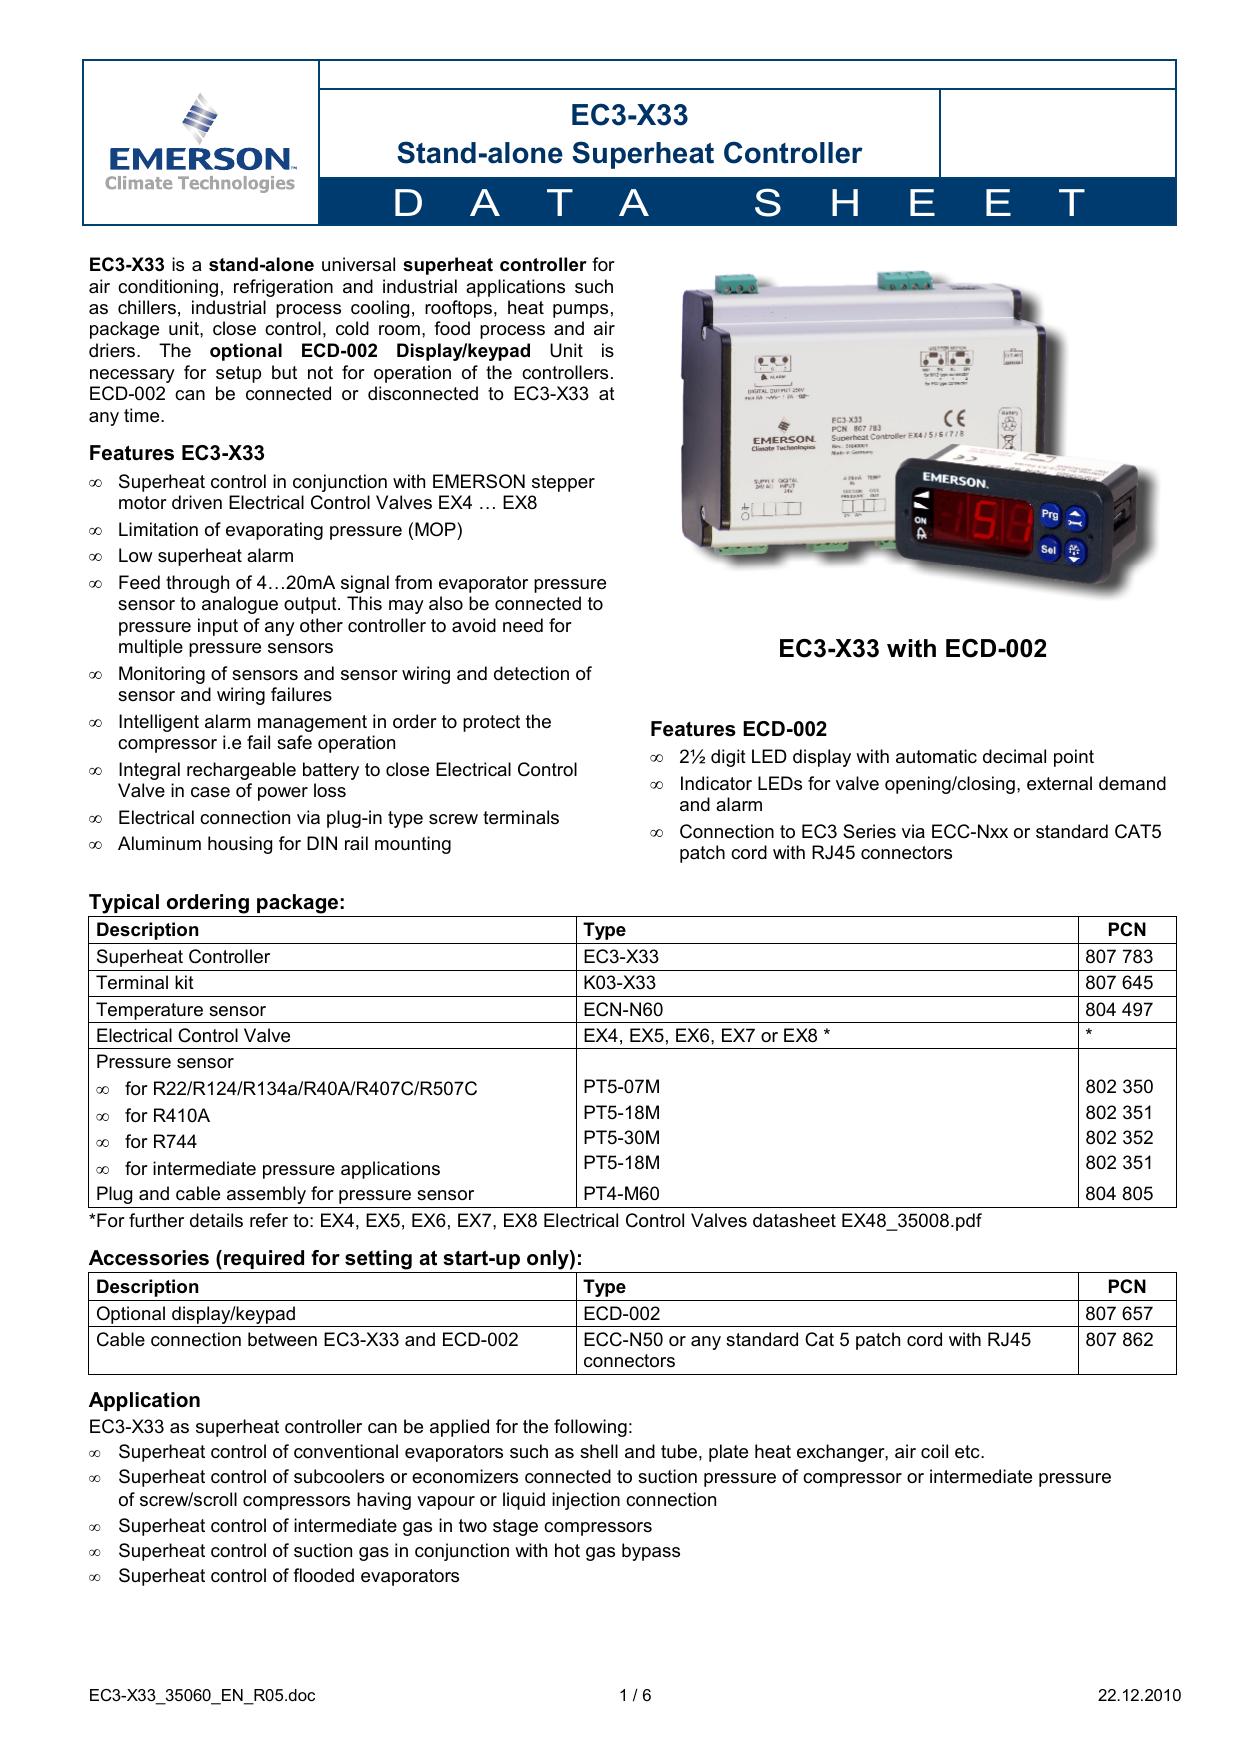 EC3-X33 - Emerson Climate Technologies   manualzz com